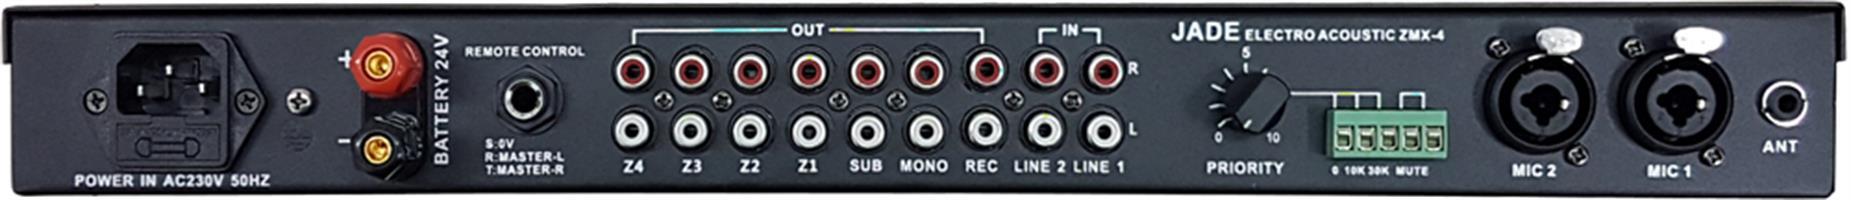 ZMX4,בקר שמע ל- 4 אזורי השמעה וכולל נגן מובנה,להתקנת קבע